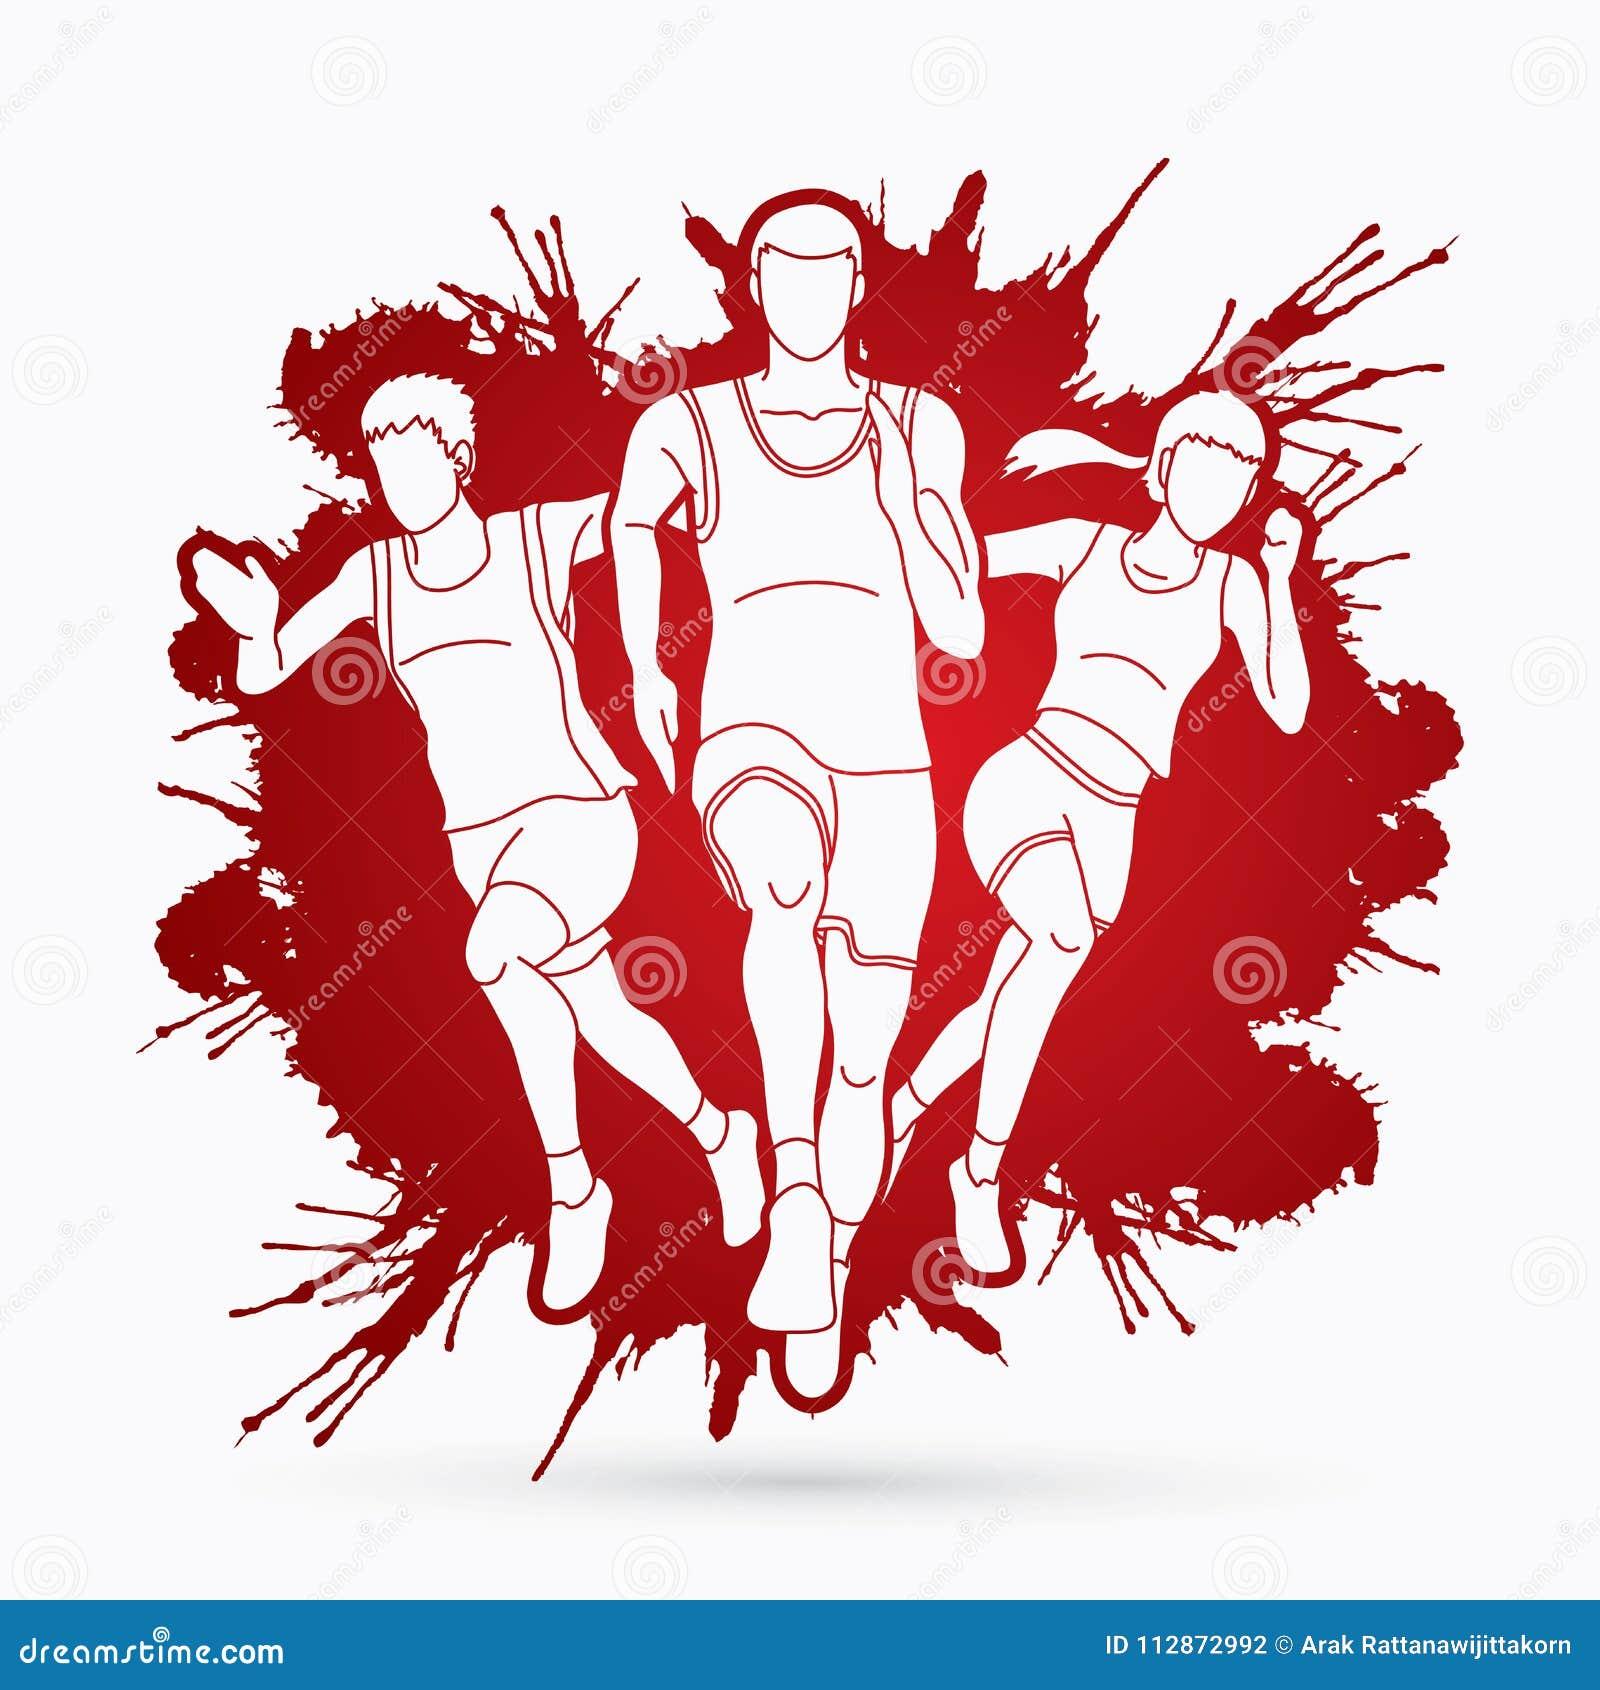 abaf0ee2fc Marathon Runner